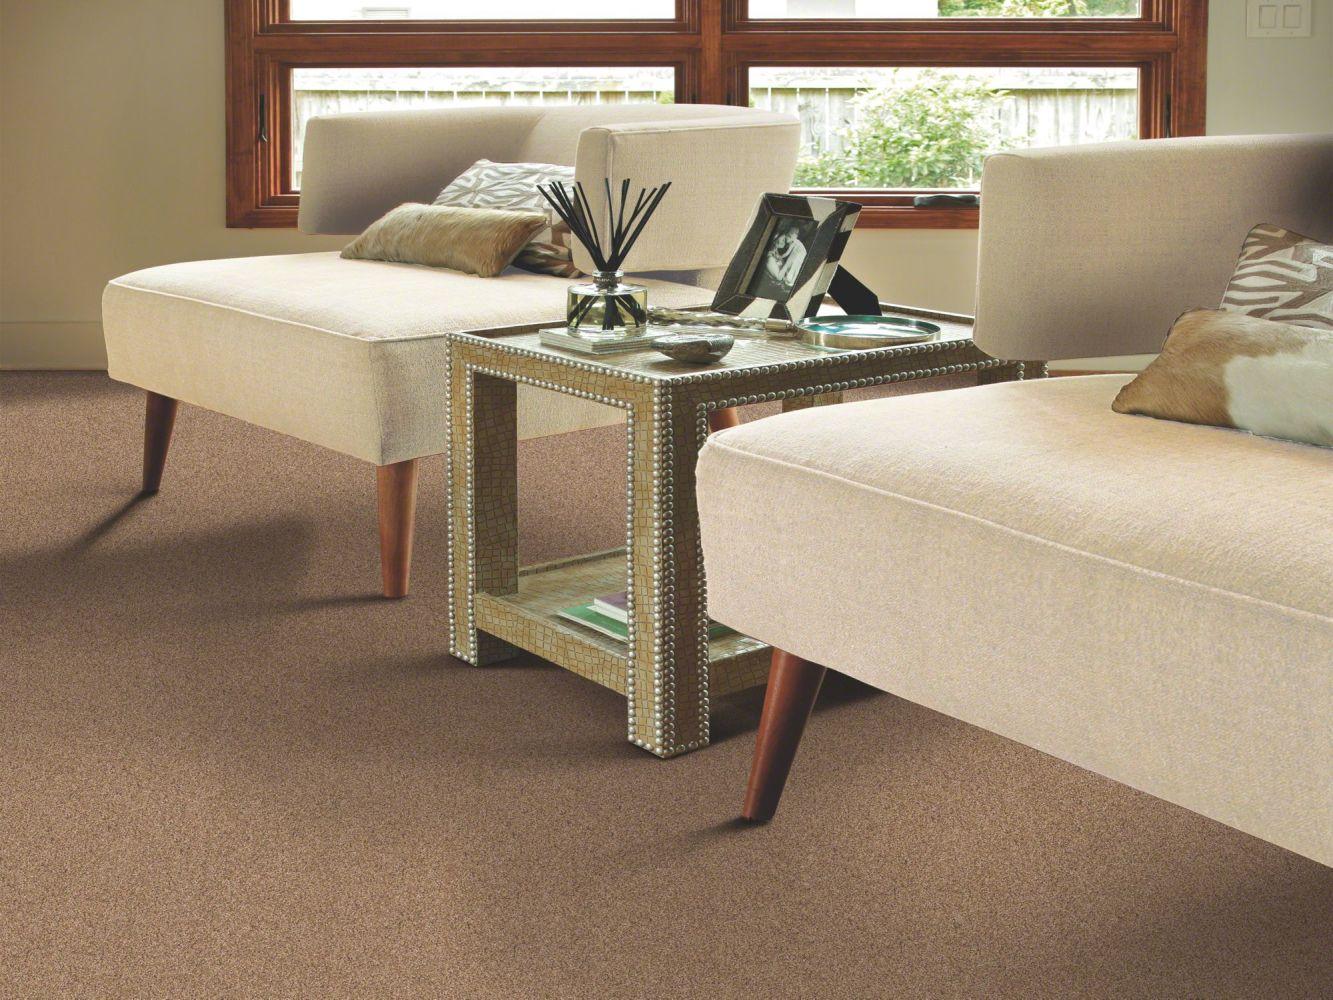 Shaw Floors Shaw Flooring Gallery Great Beginnings (a) Macadamia 00732_5508G